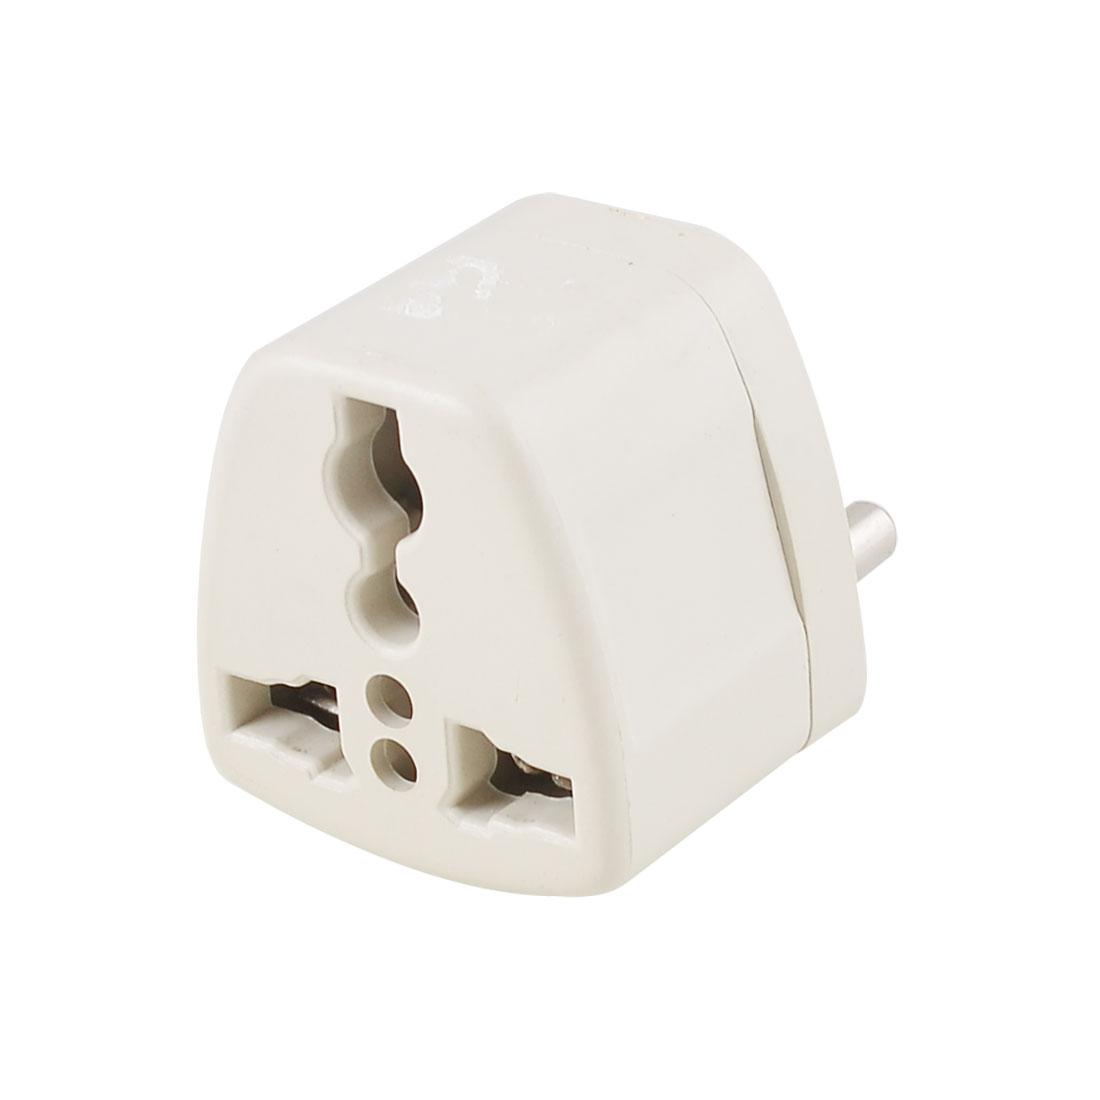 AC 250V 10A EU Plug to EU AU US Socket Travel Wall Adapter Converter Gray